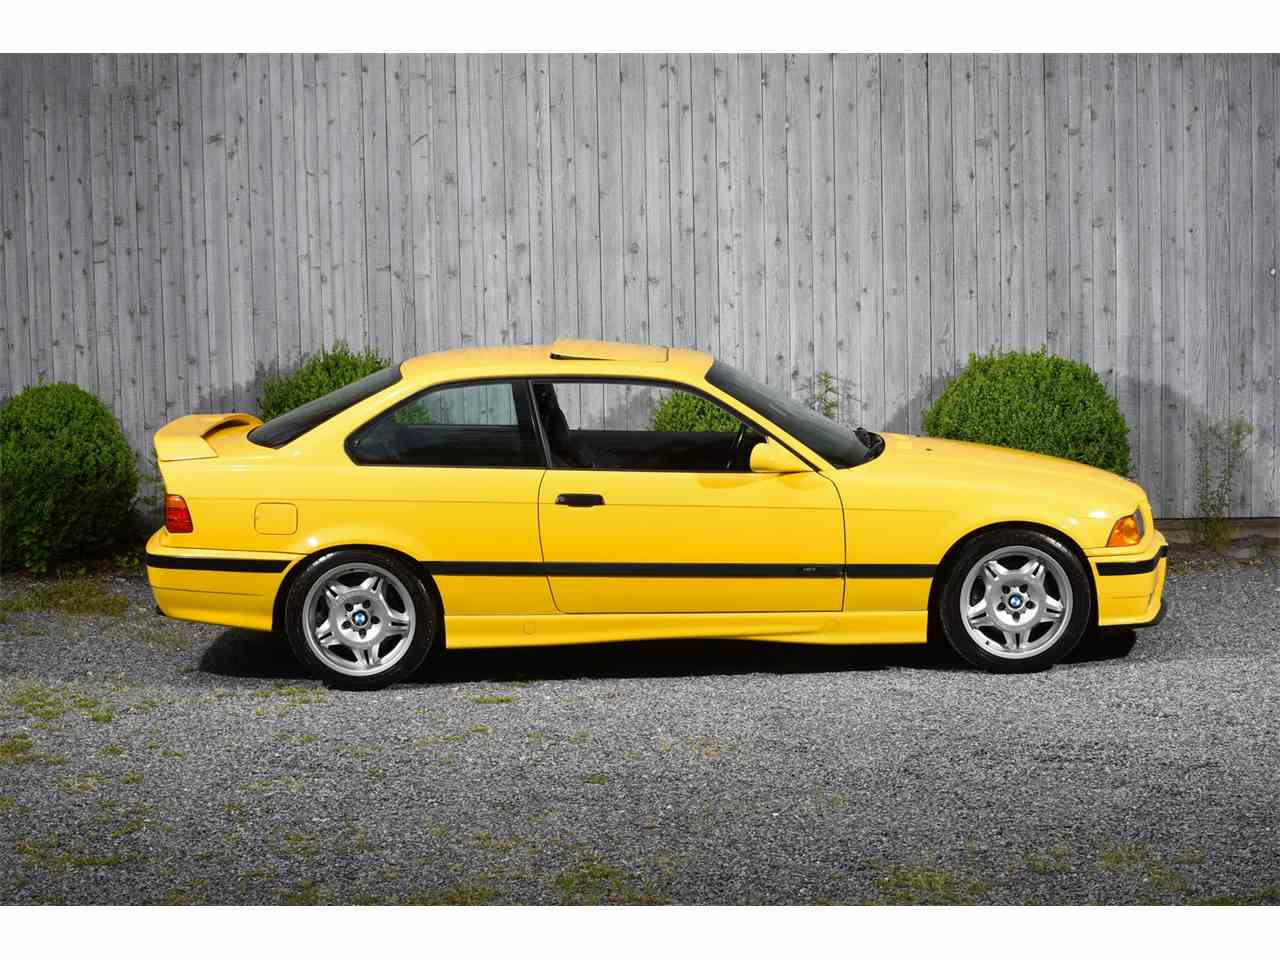 BMW M For Sale ClassicCarscom CC - 1994 bmw m3